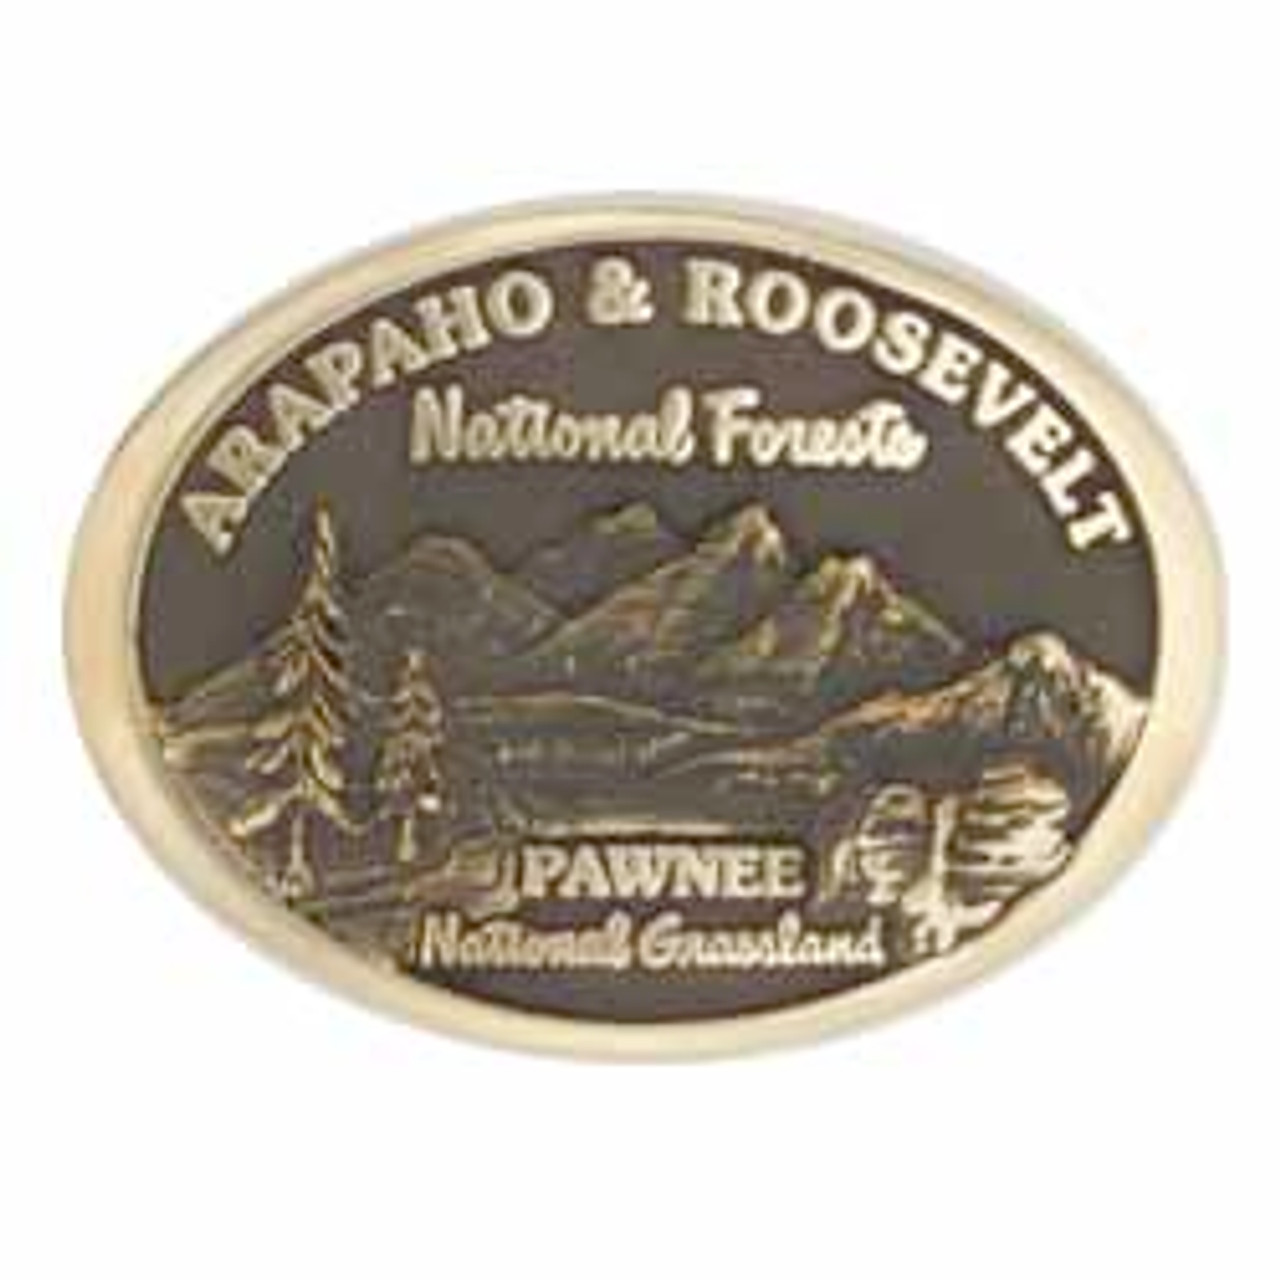 Arapaho and Roosevelt National Forest-Pawnee National Grassland Buckle